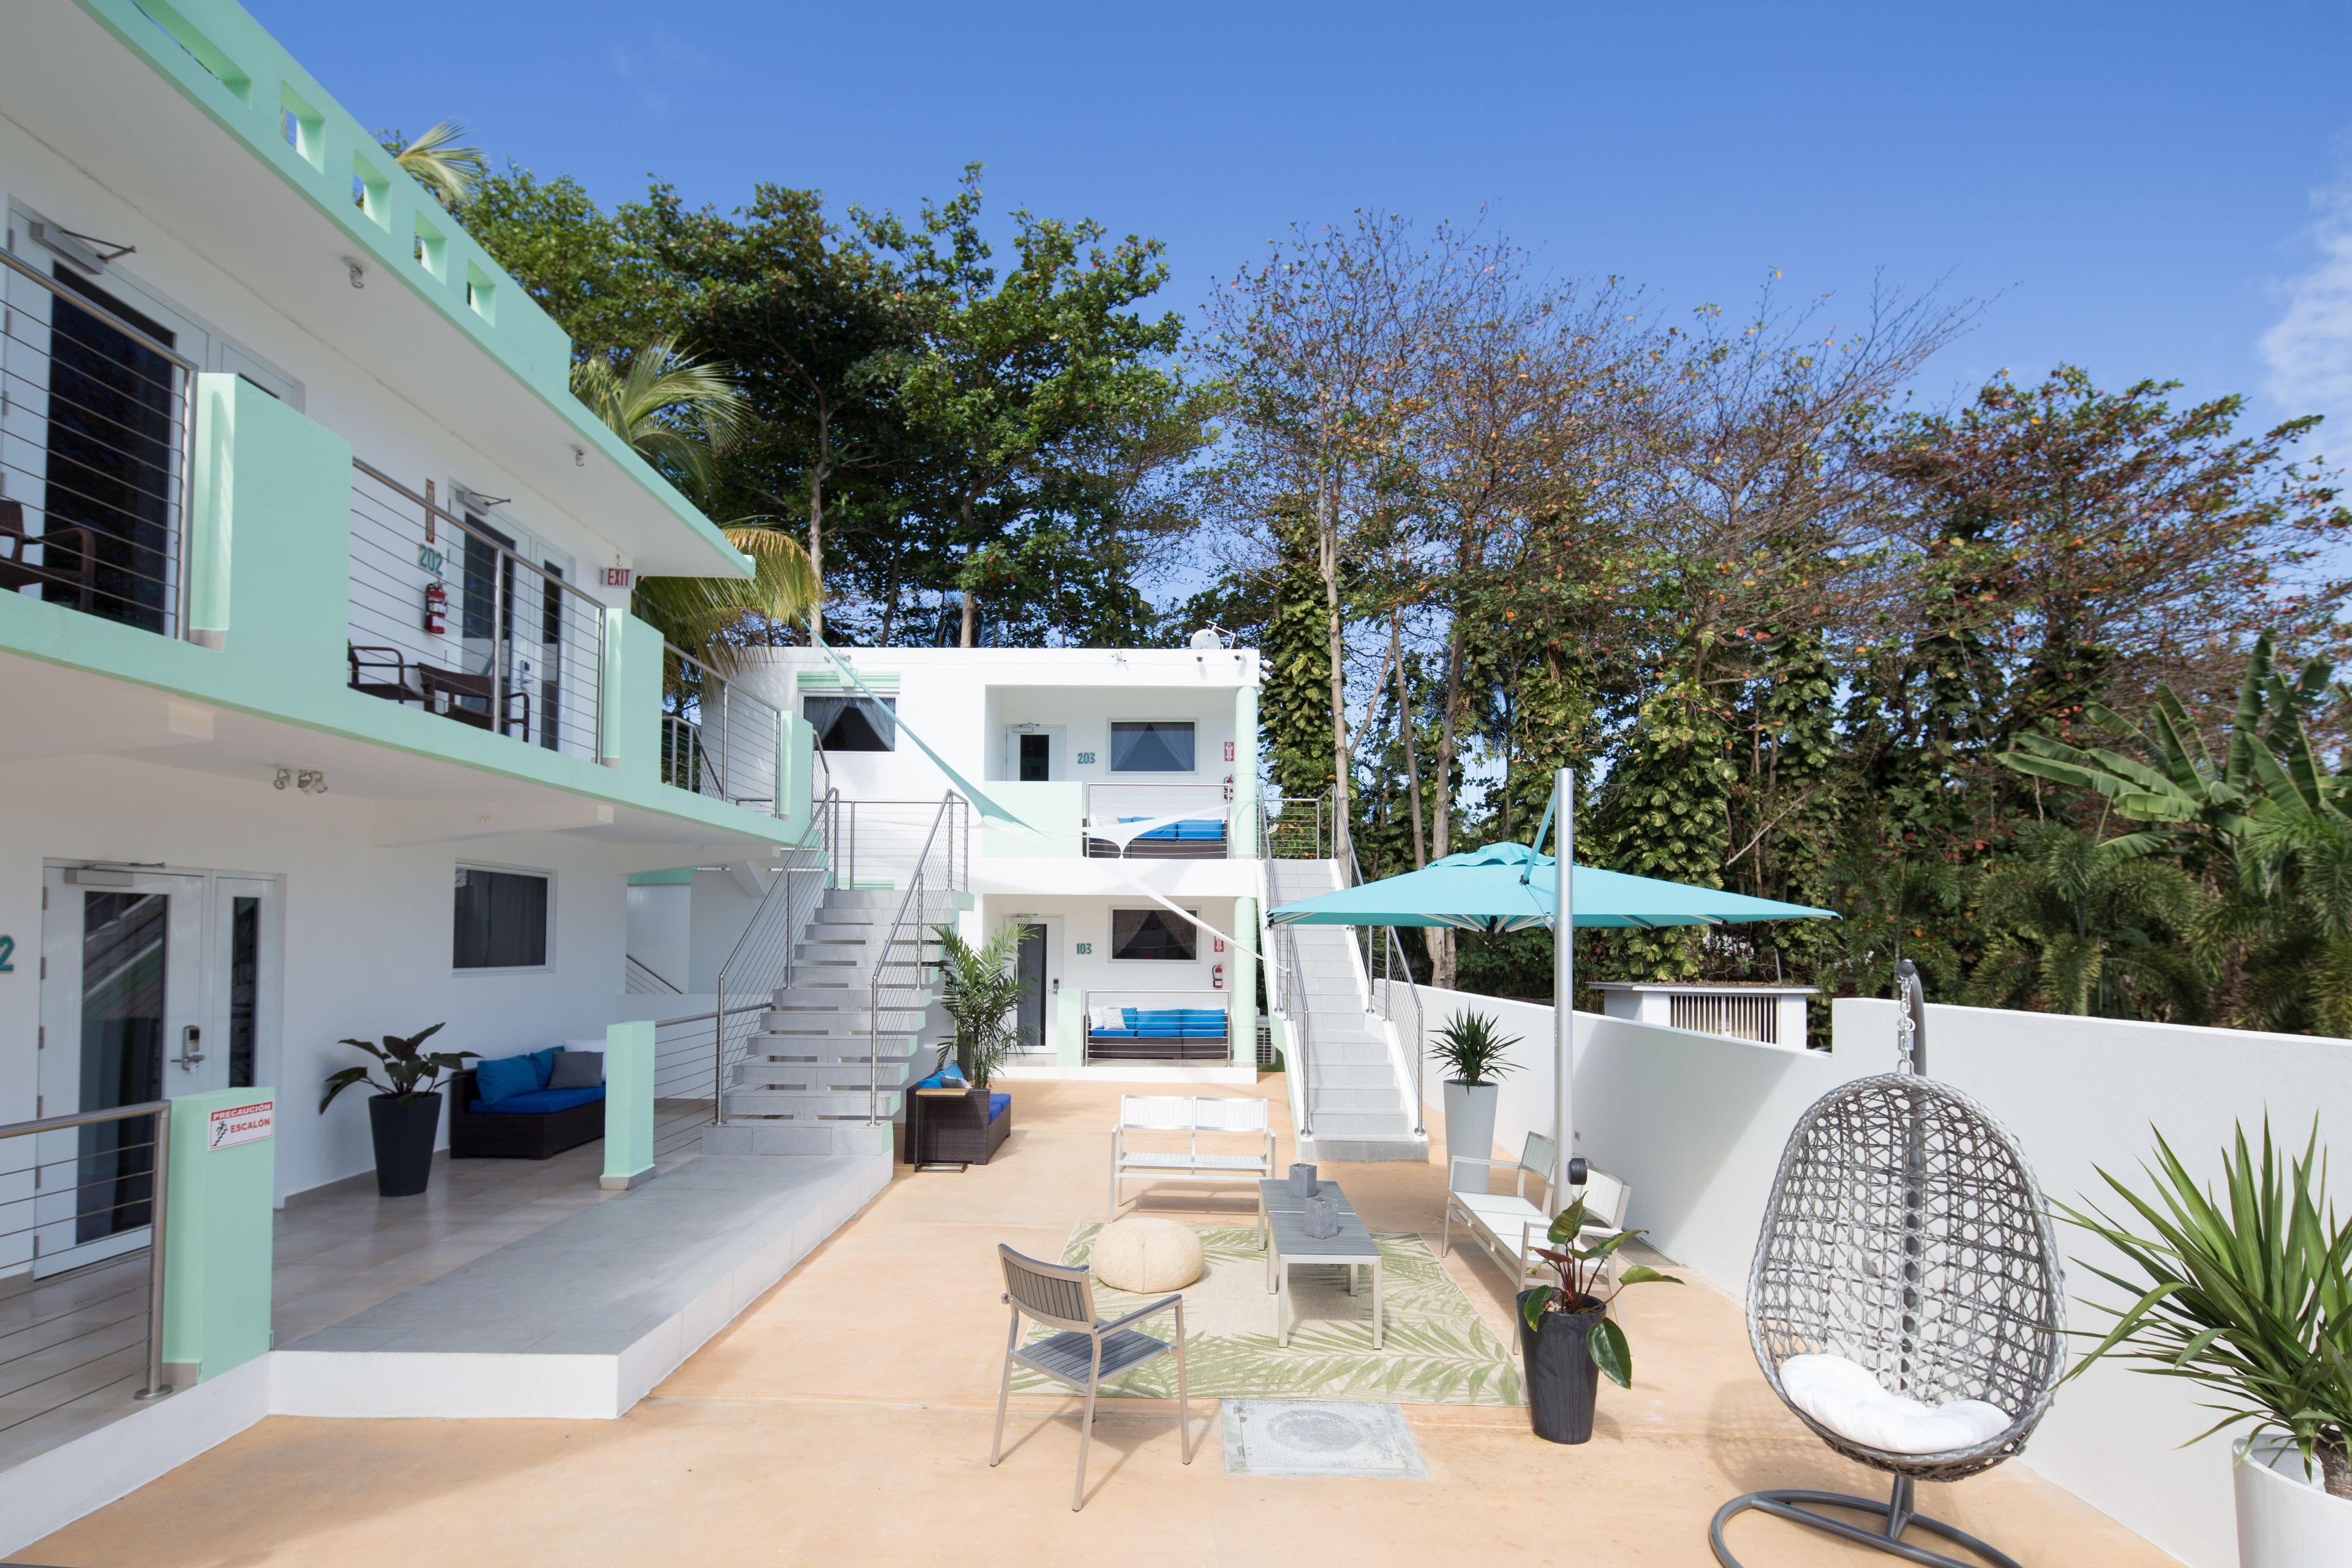 Courtesy of Casa Verde Hotel / Expedia